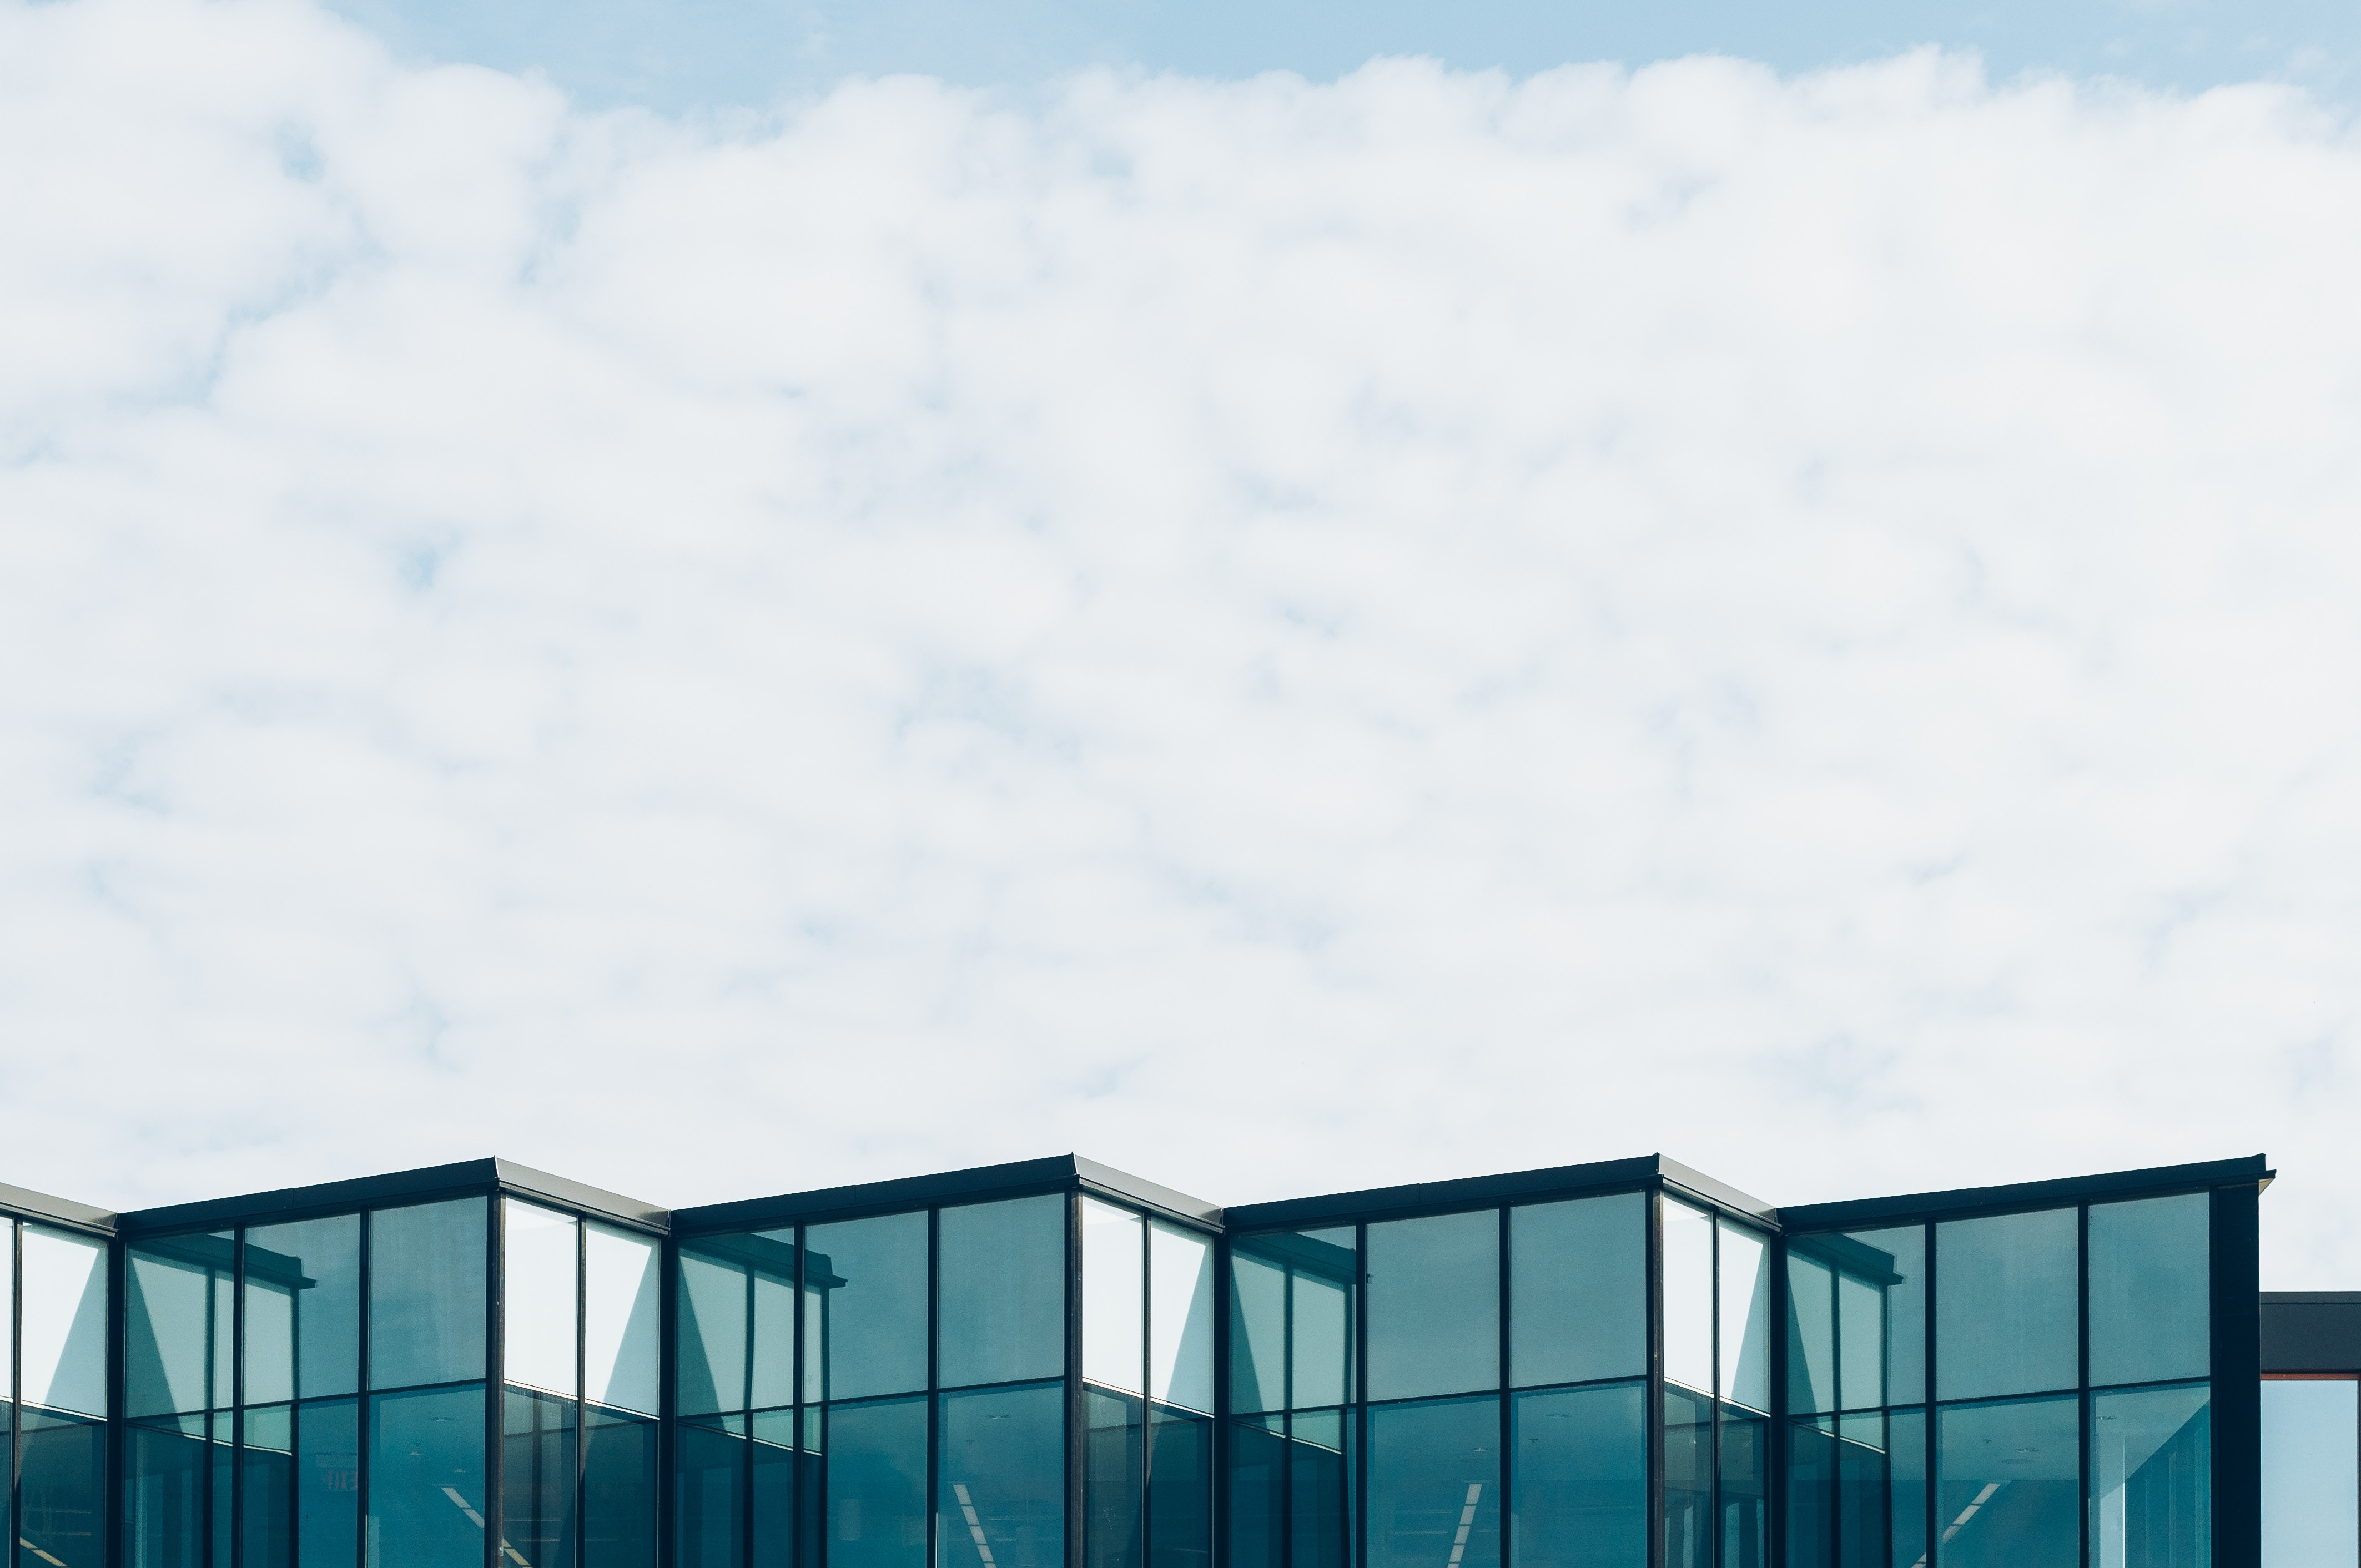 architectural-architectural-design-architecture-1029606 (1)